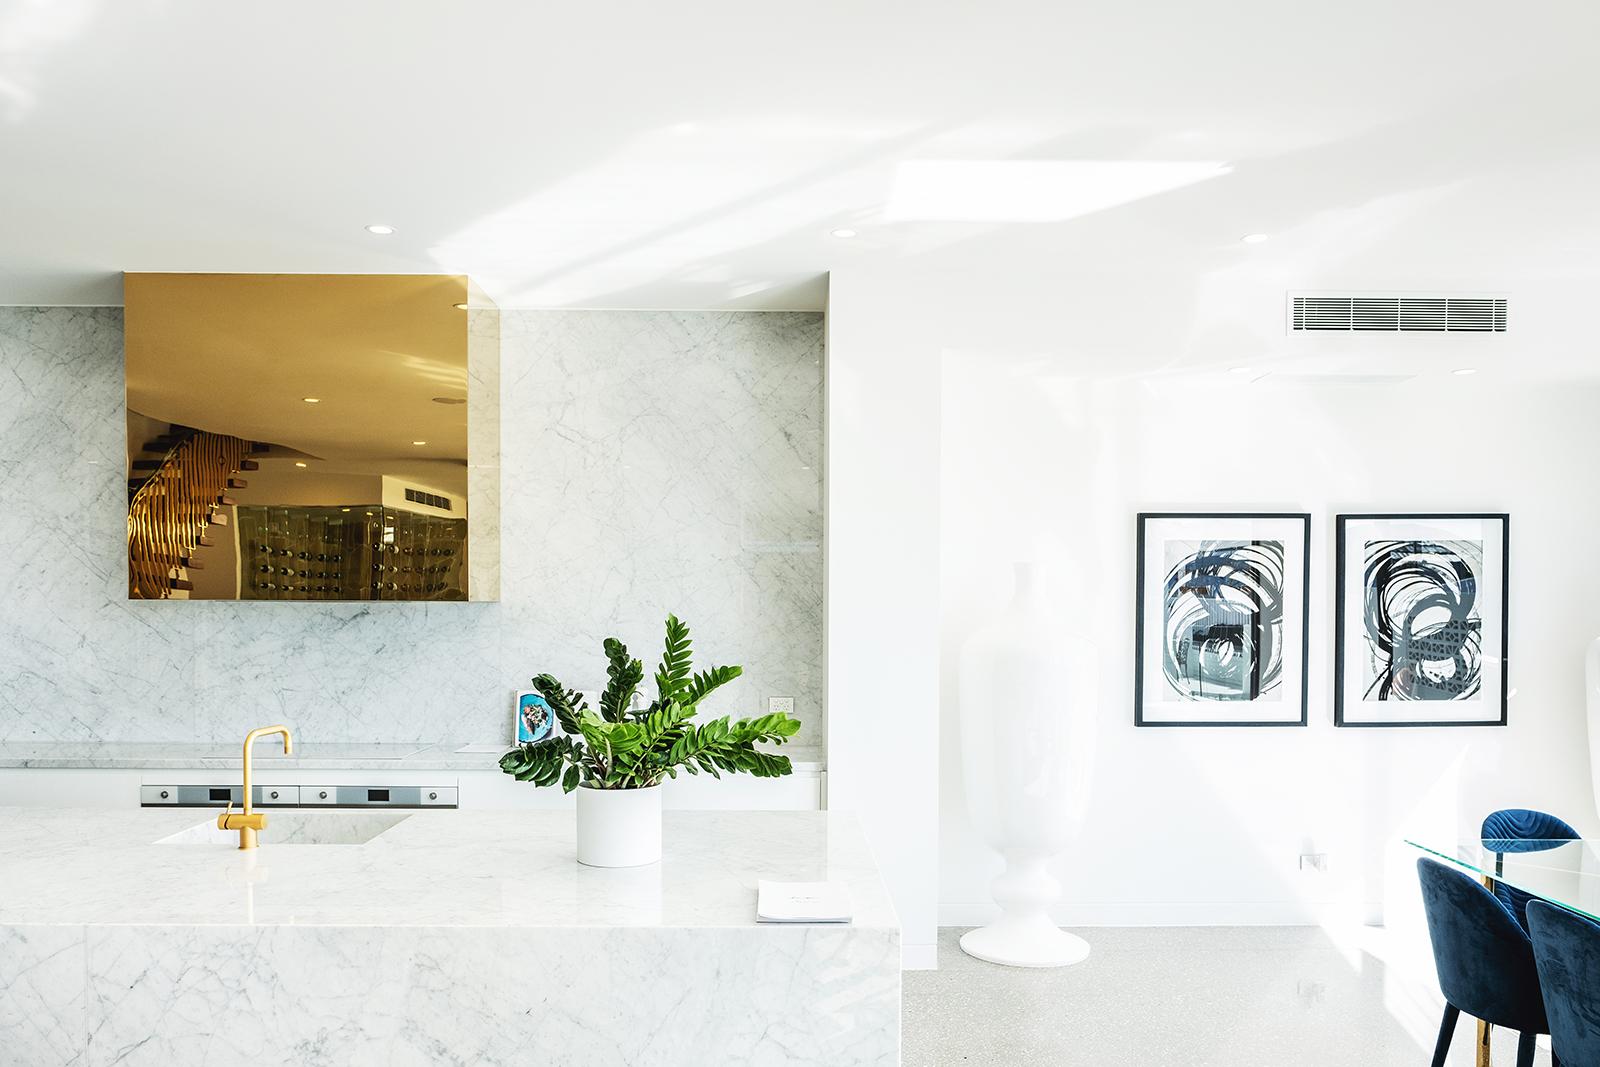 aston_milan_kitchen_helensvale_palm_springs_style_glamour_luxe_luxury_white.jpg